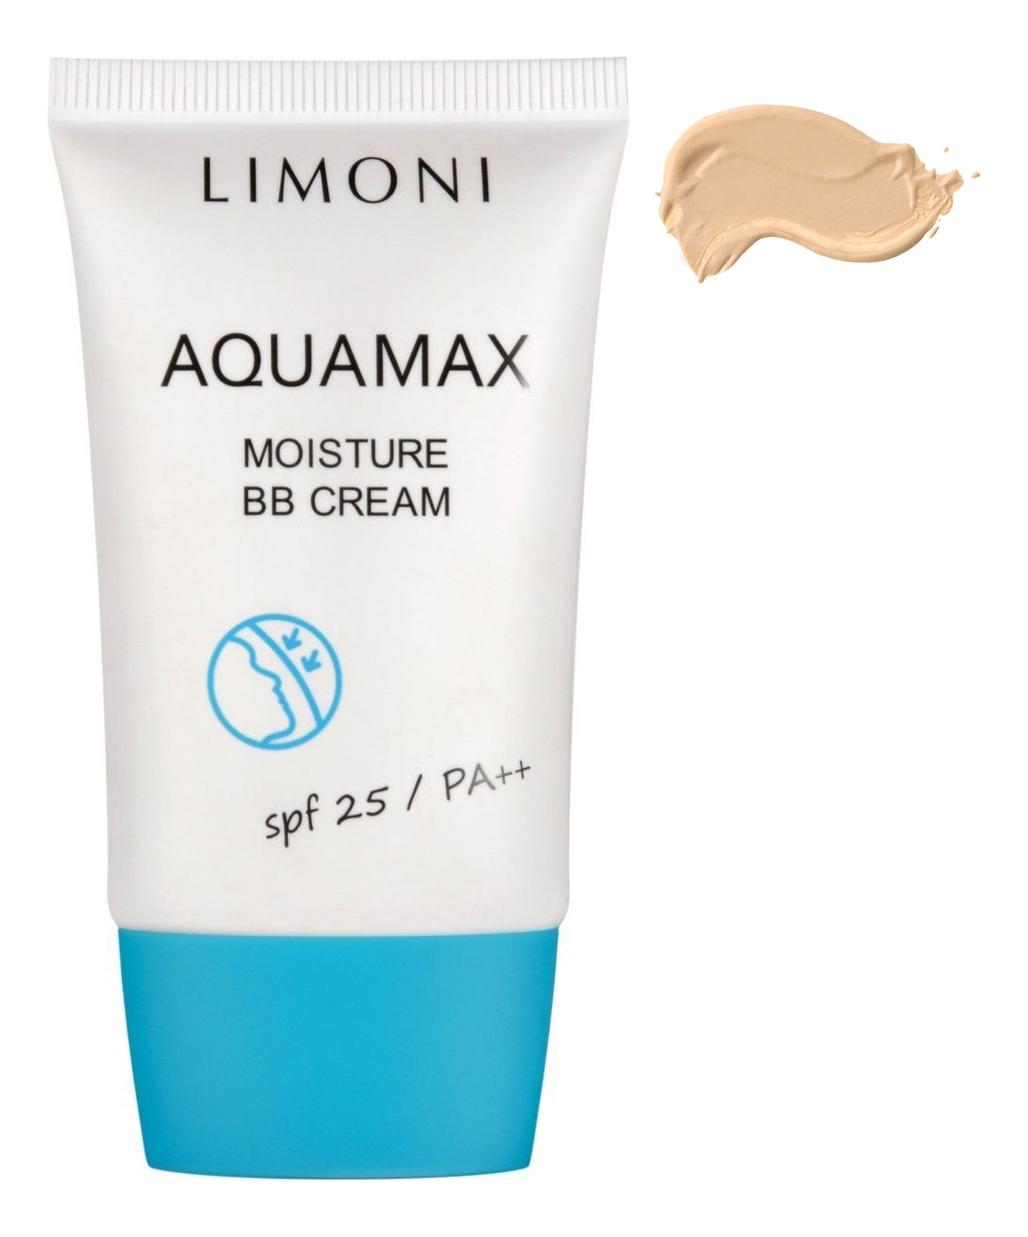 Купить BB крем для лица увлажняющий Aquamax Moisture Cream SPF25 PA++ 40мл: No 1, Limoni